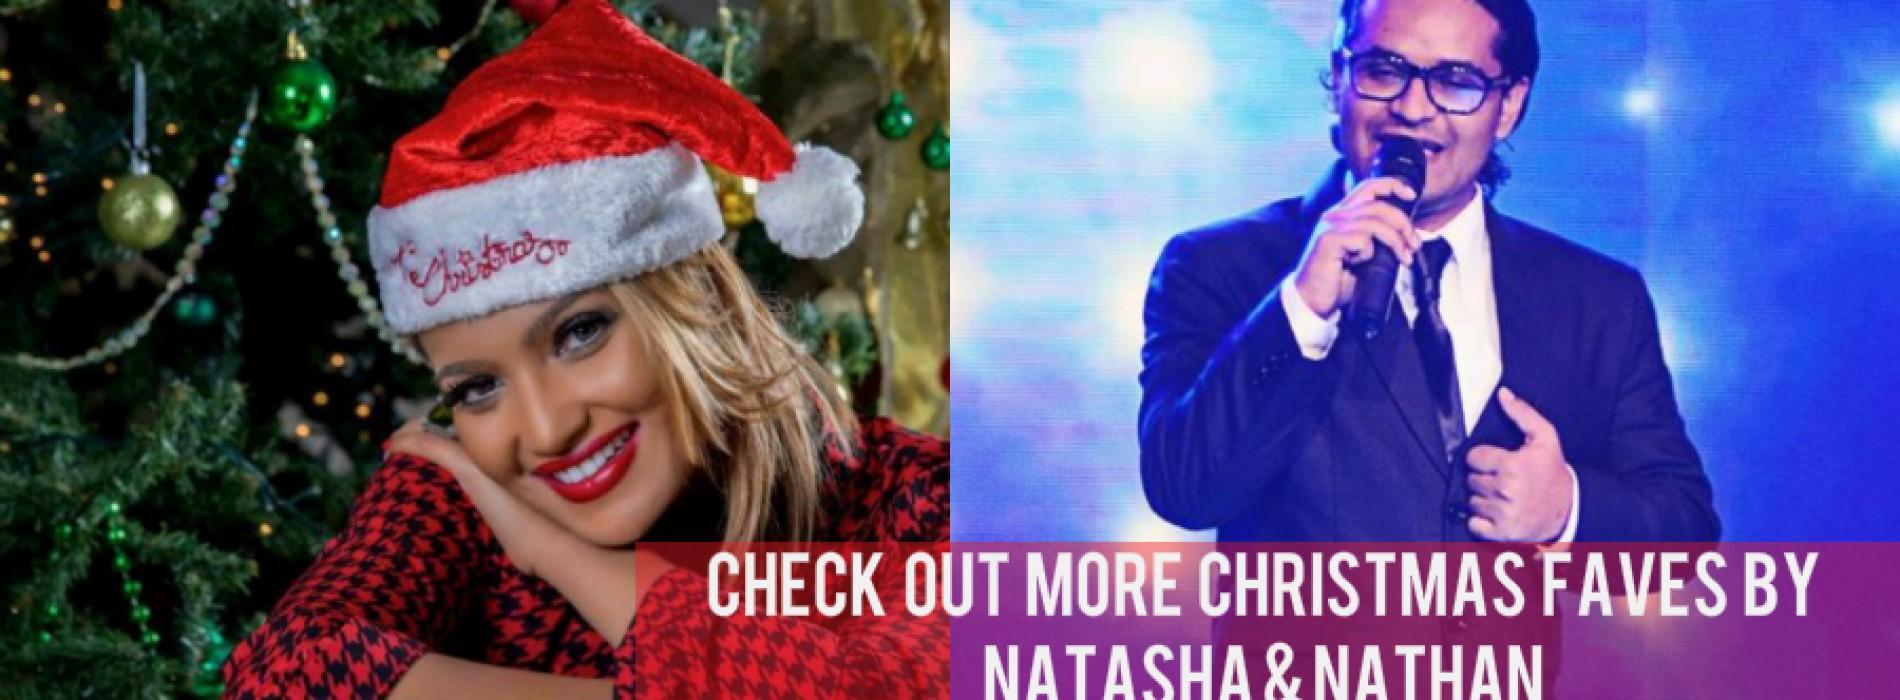 More Christmas Faves From Nathan & Natasha